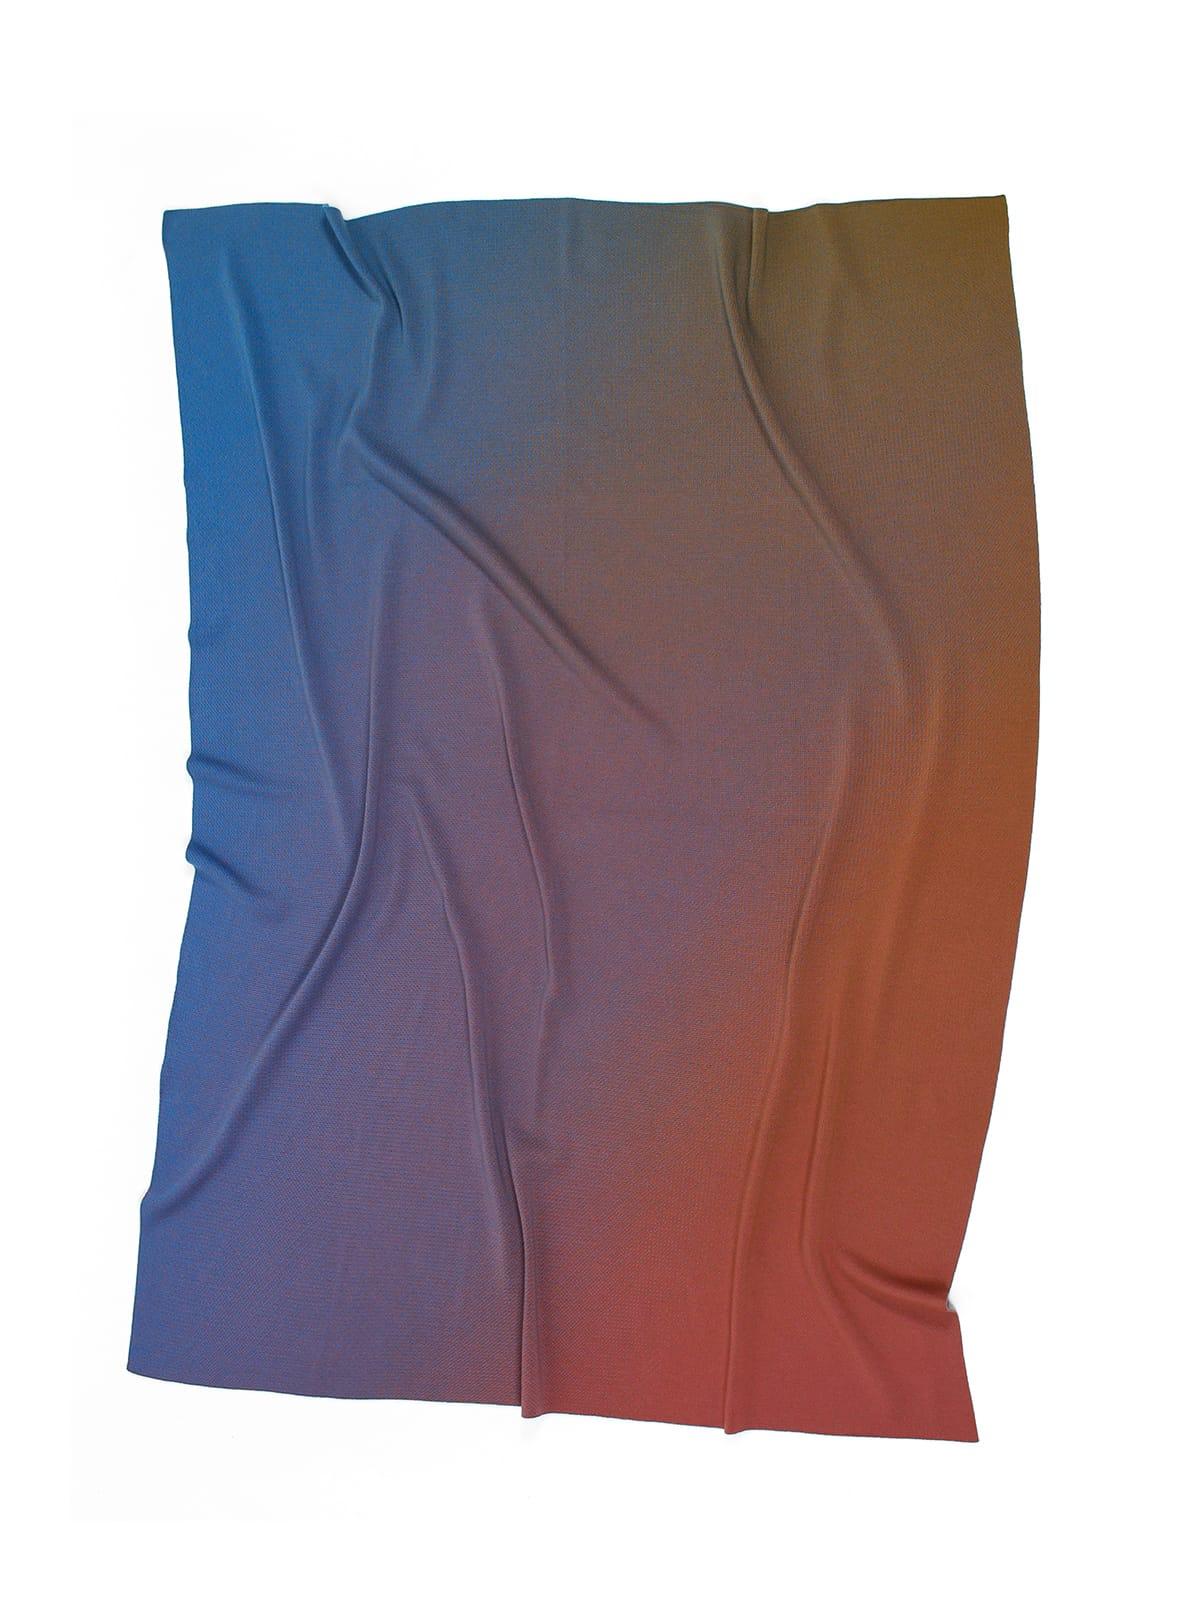 Knitted Blanket Lucca - Merino Wool